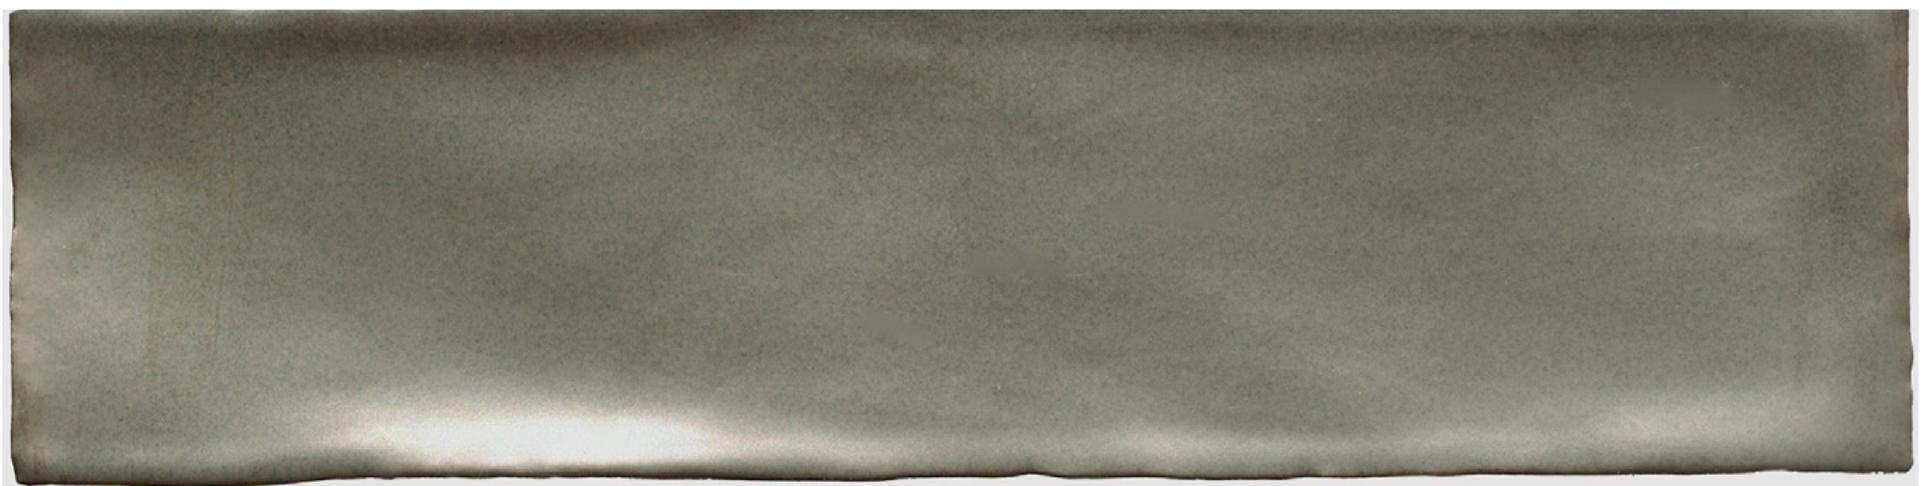 Silver  UD.OX.SIL.0312.MET | Matte